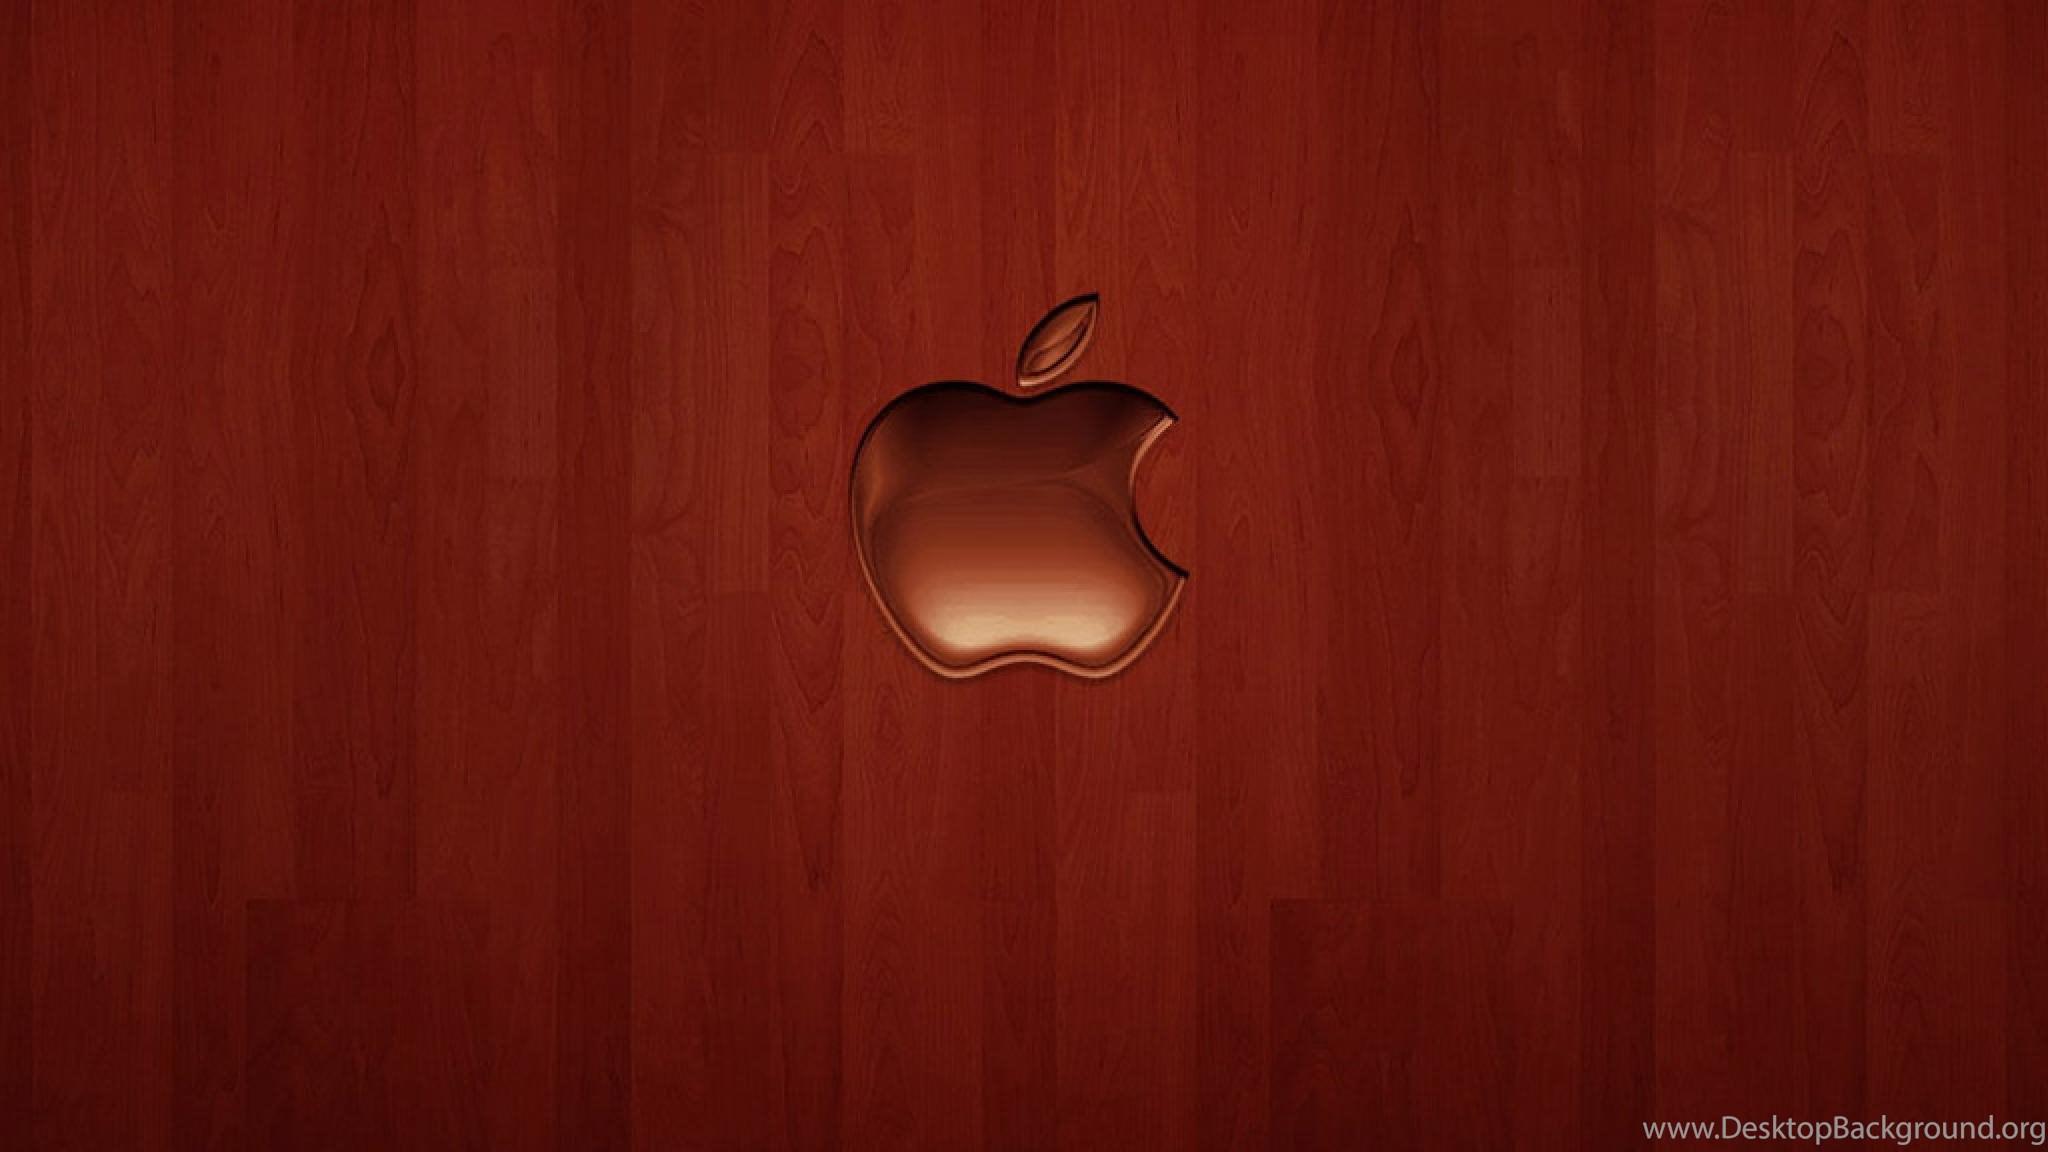 desktop green apple wood wallpapers hd download desktop background